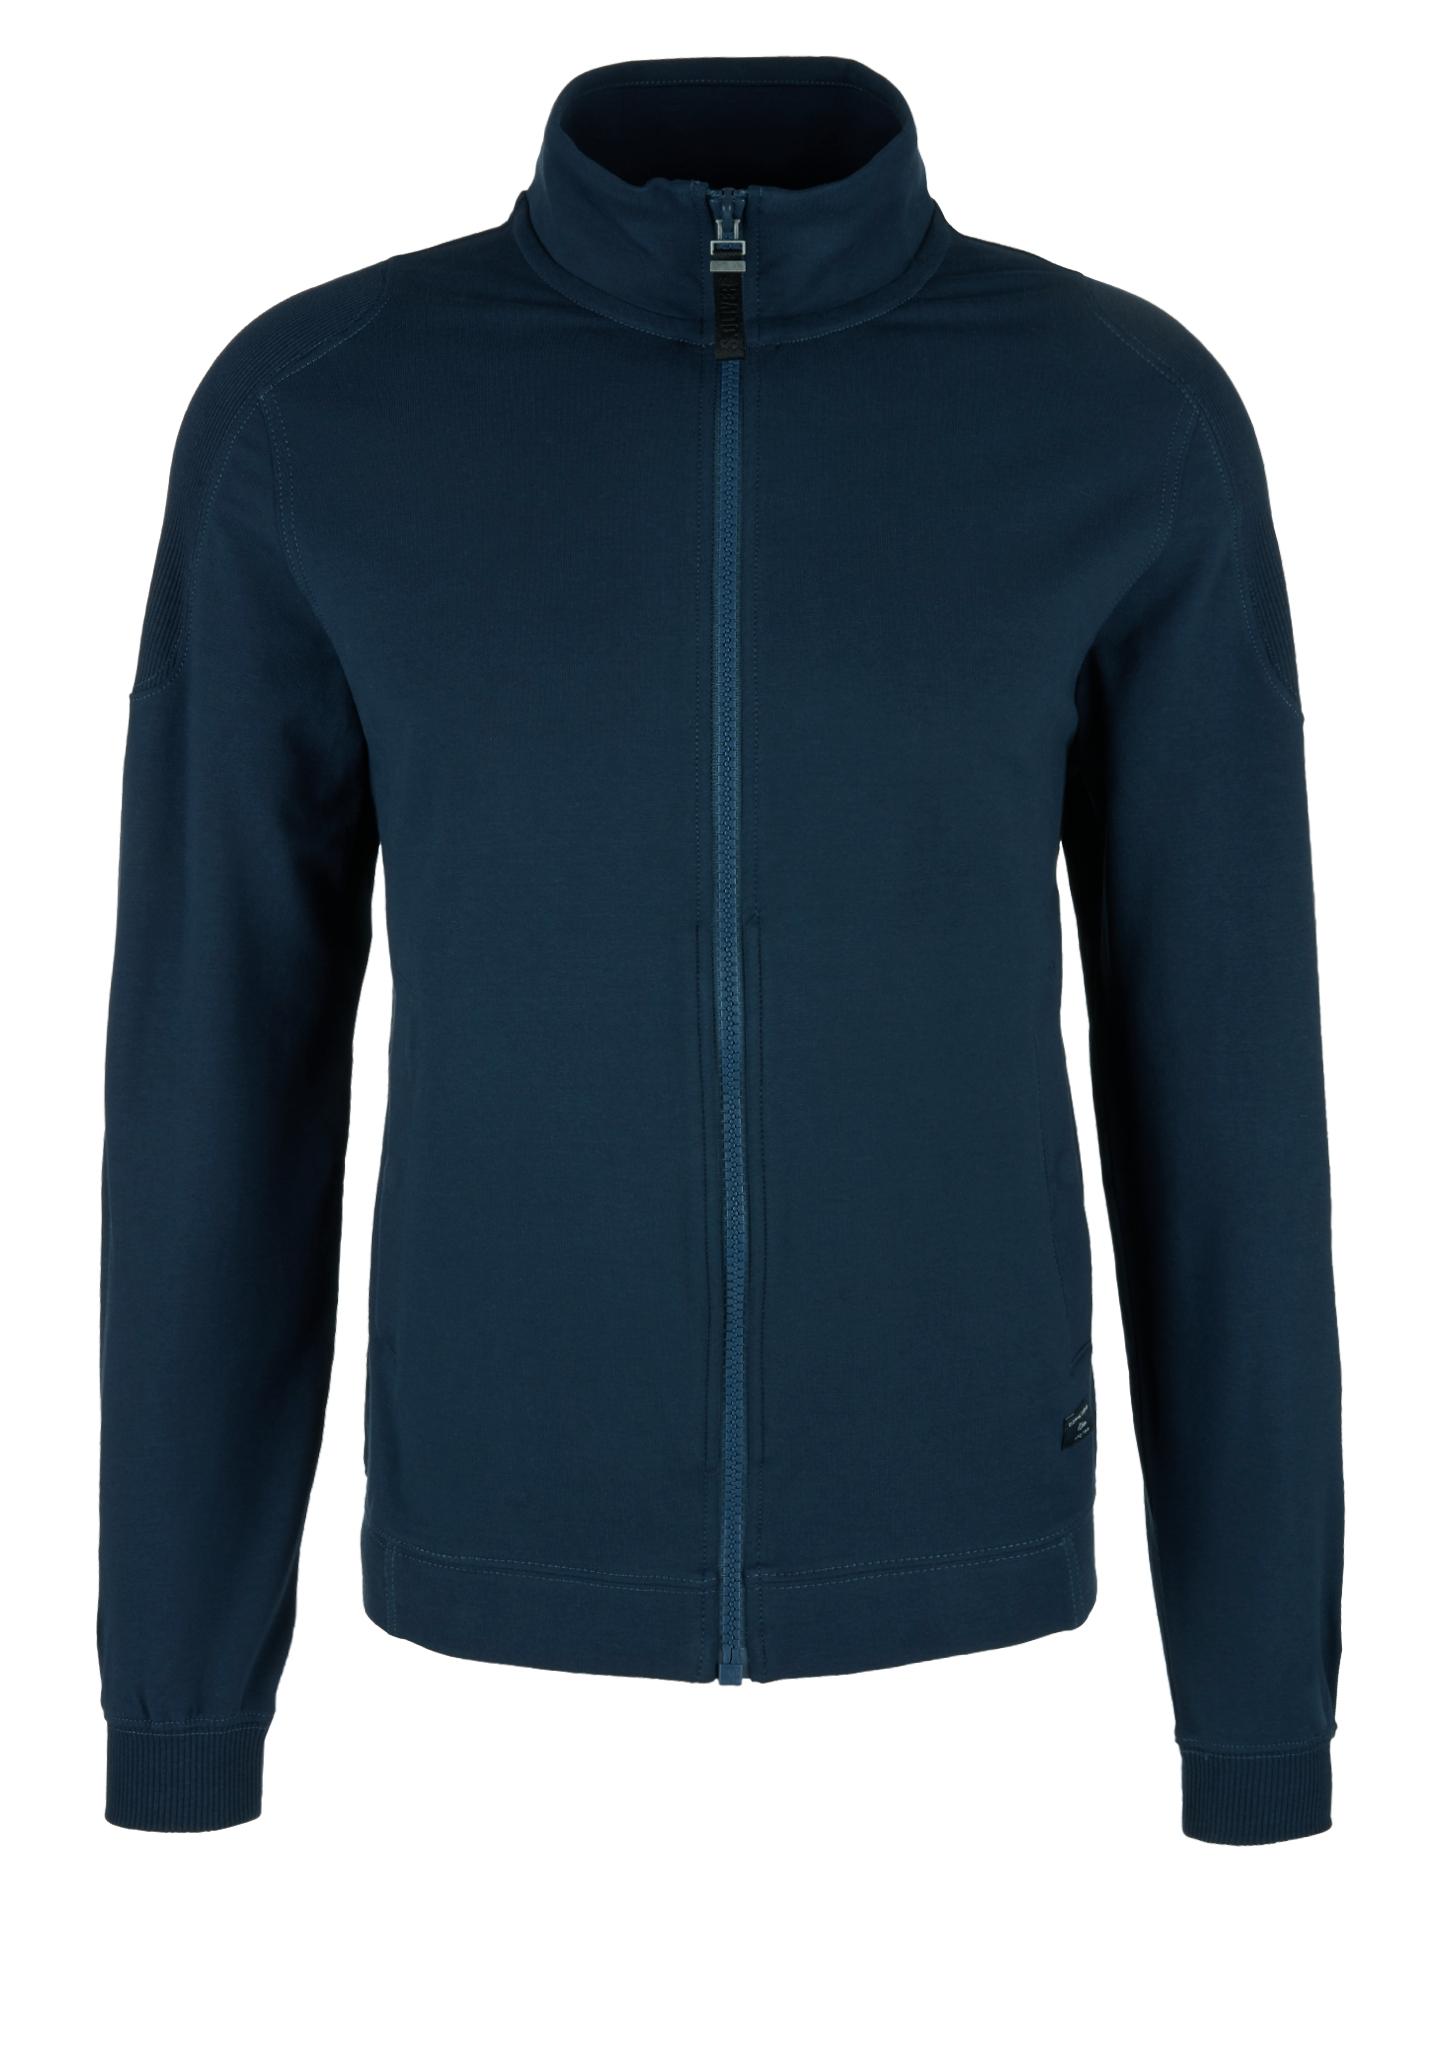 Sweatjacke | Bekleidung > Sweatshirts & -jacken | Blau | 95% baumwolle -  5% elasthan | s.Oliver